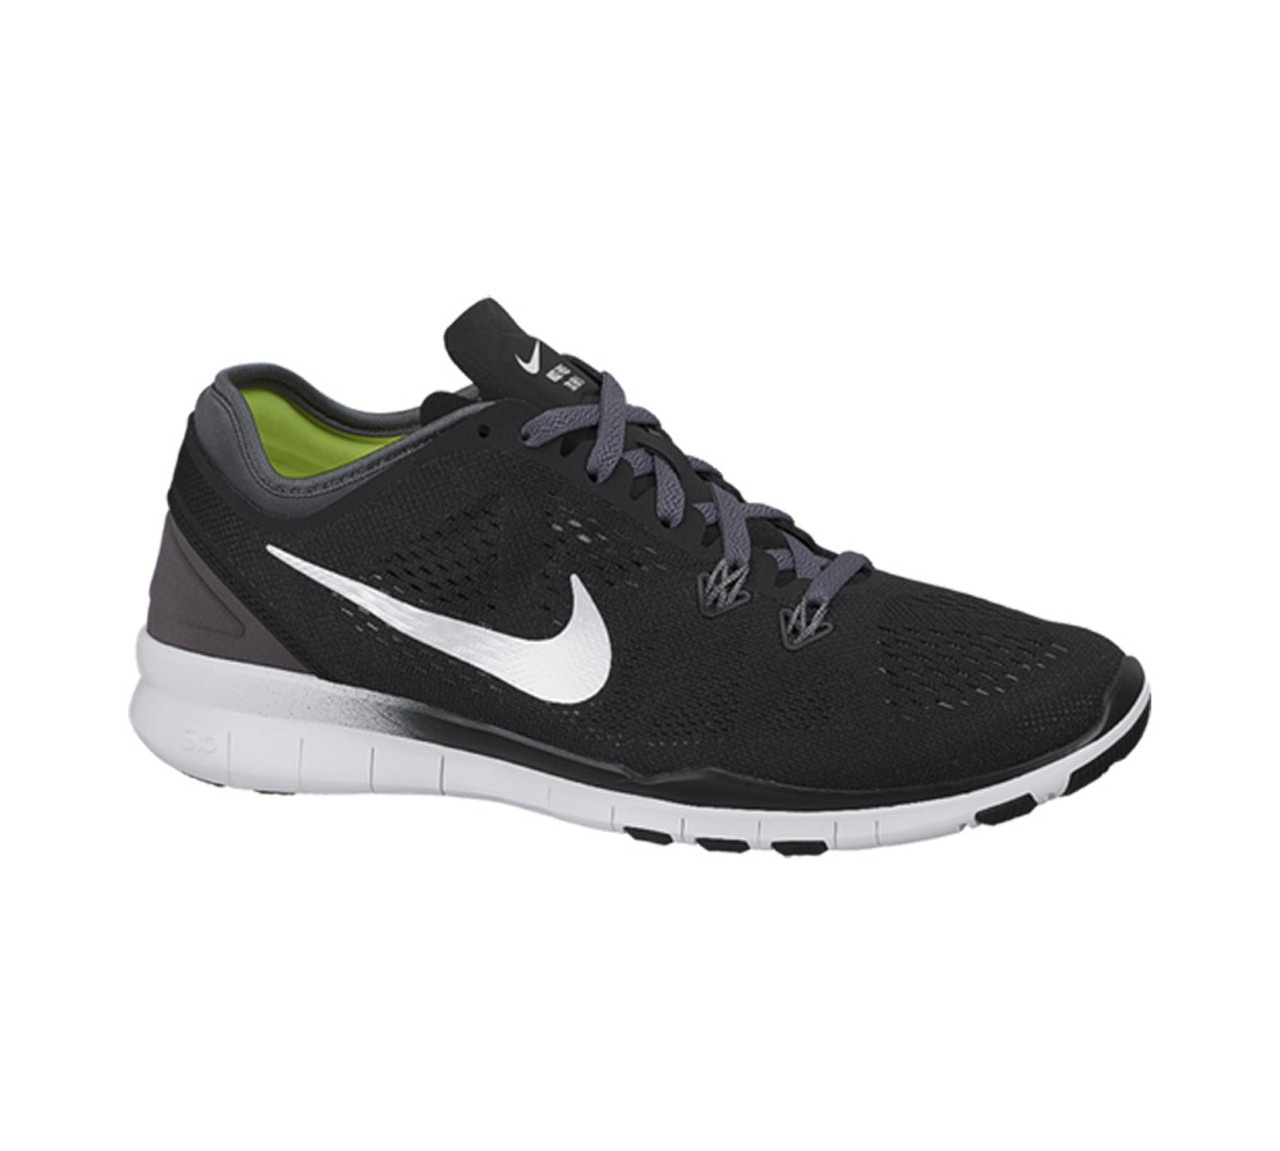 Nike Women's Free 5.0 TR Fit 5 Cross Trainer BlackDark Grey